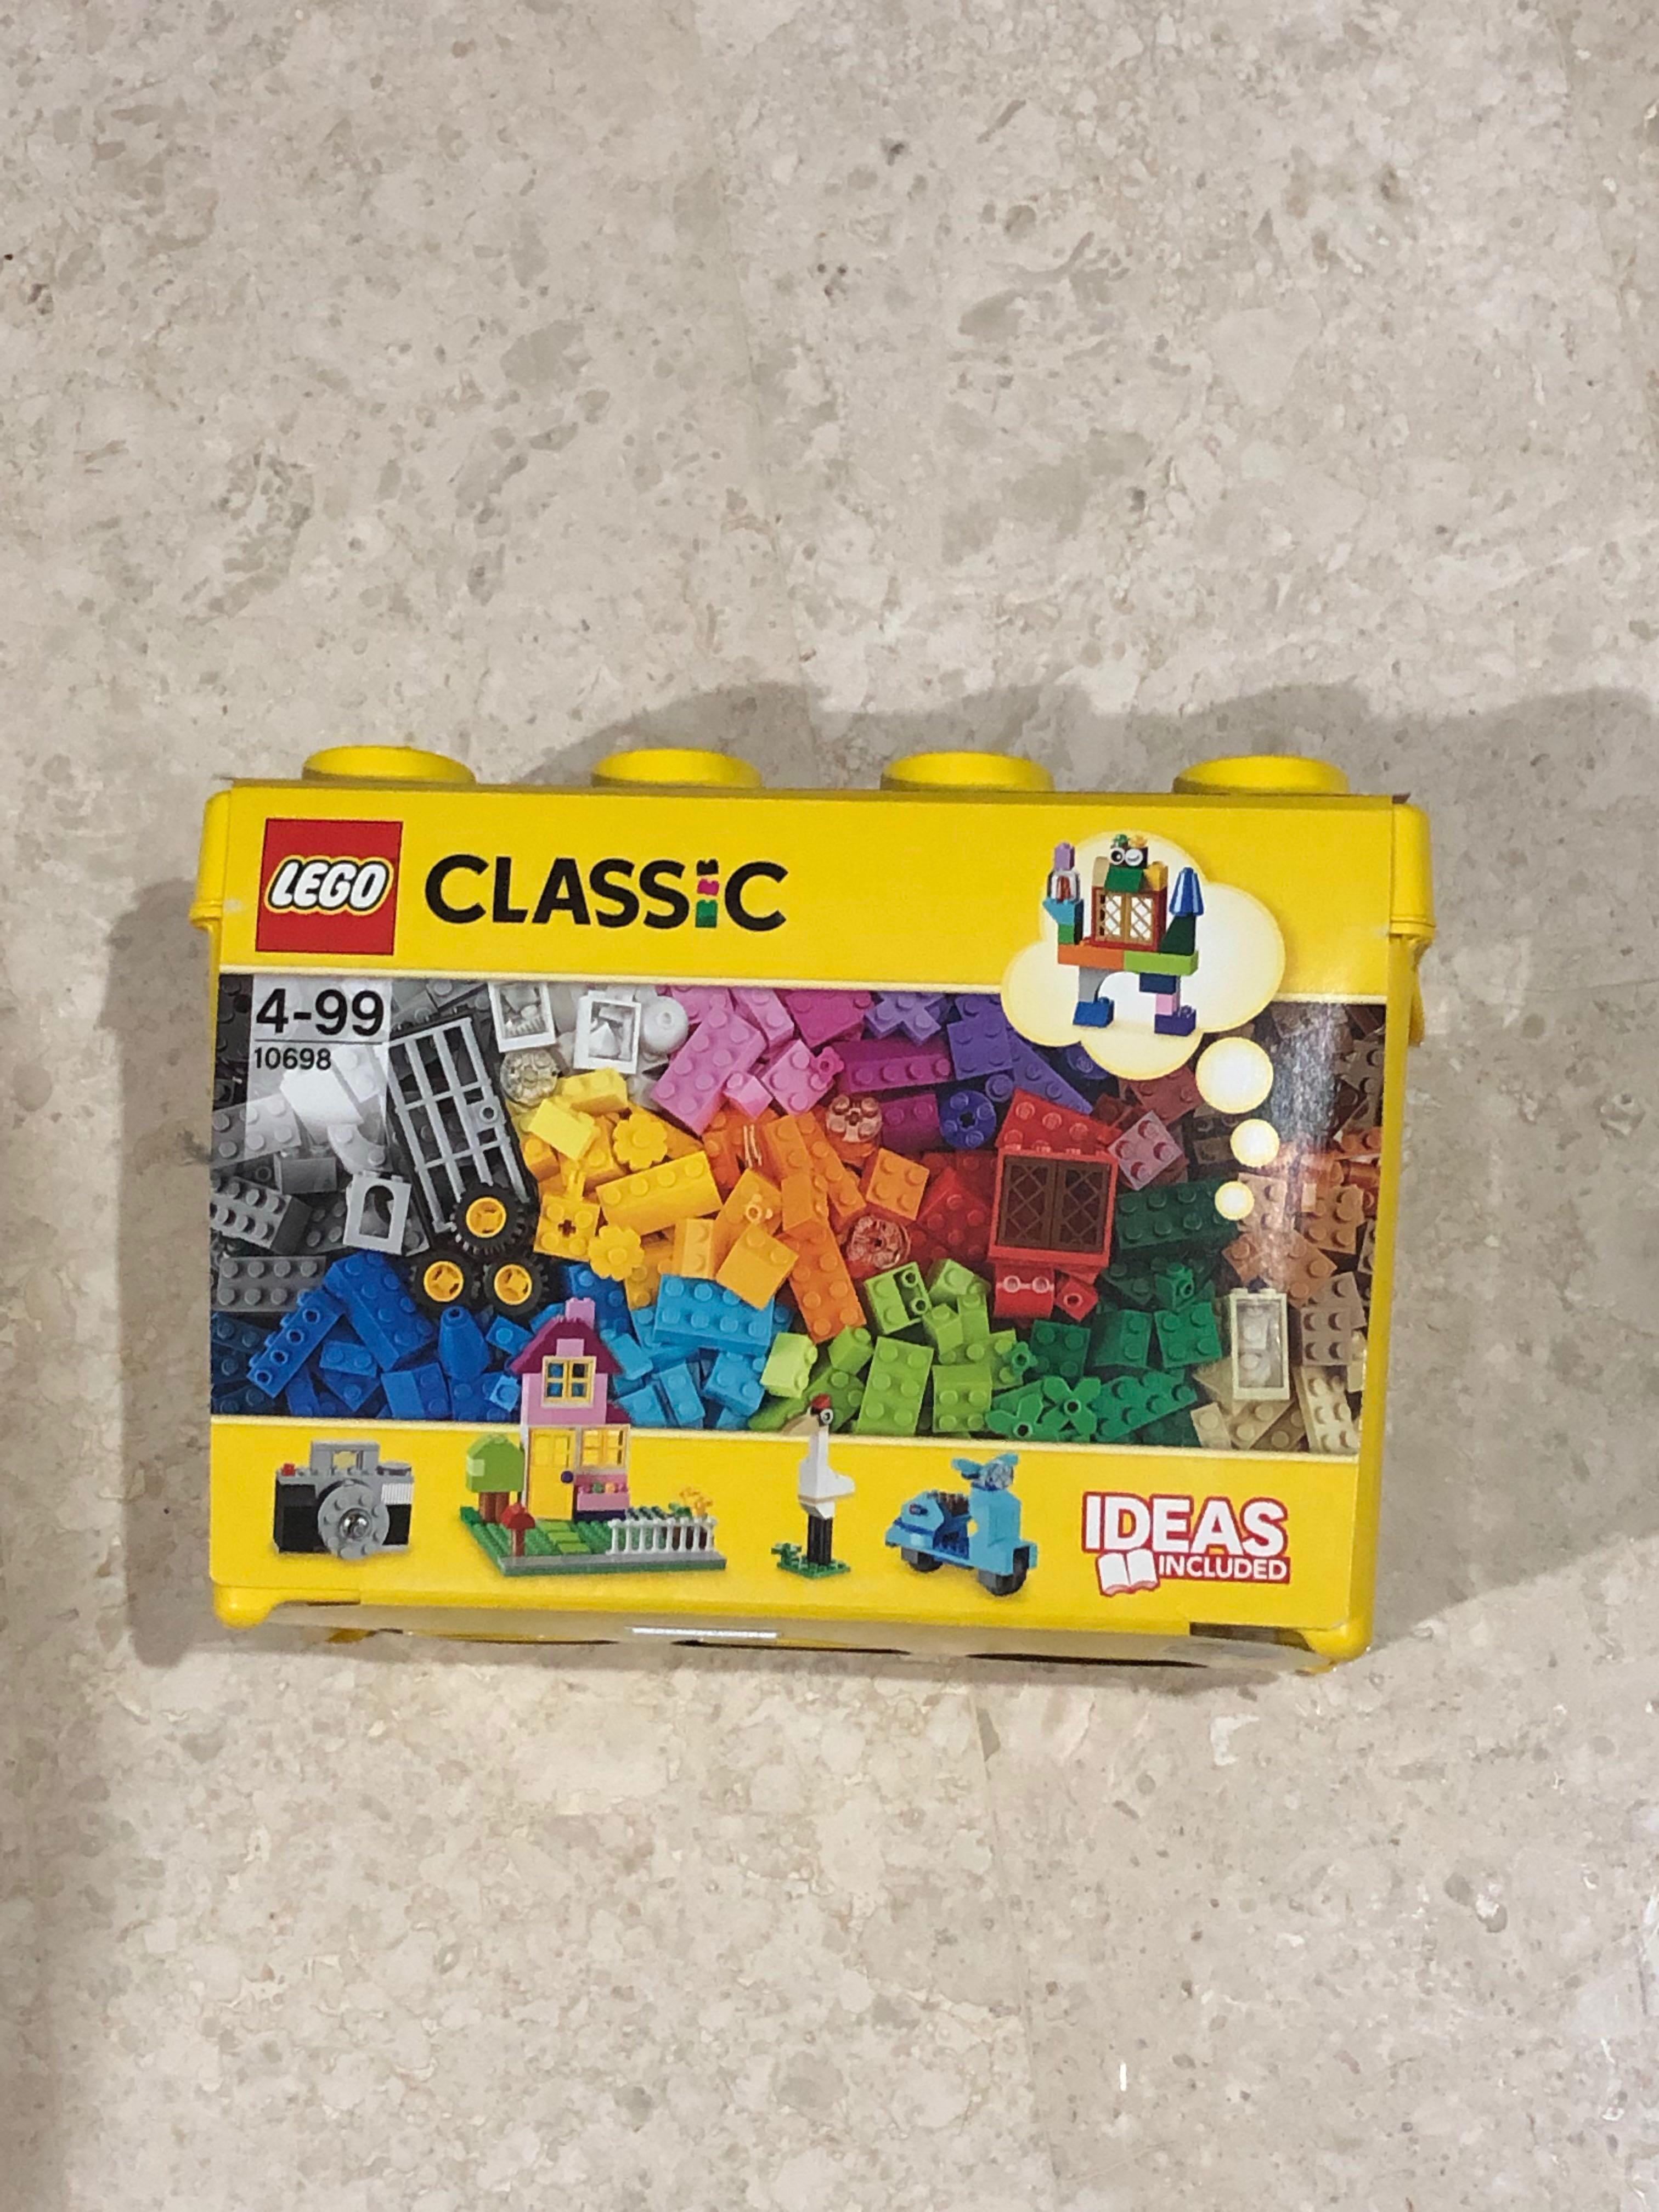 BNIB Lego Classic 10698, Toys & Games, Bricks & Figurines on